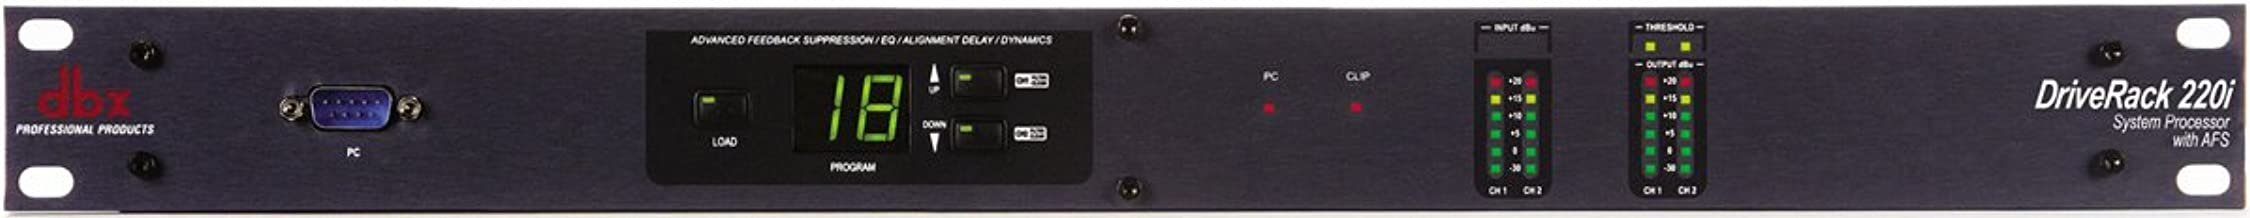 dbx DriveRack 220i System Processor with Advanced Feedback Suppression